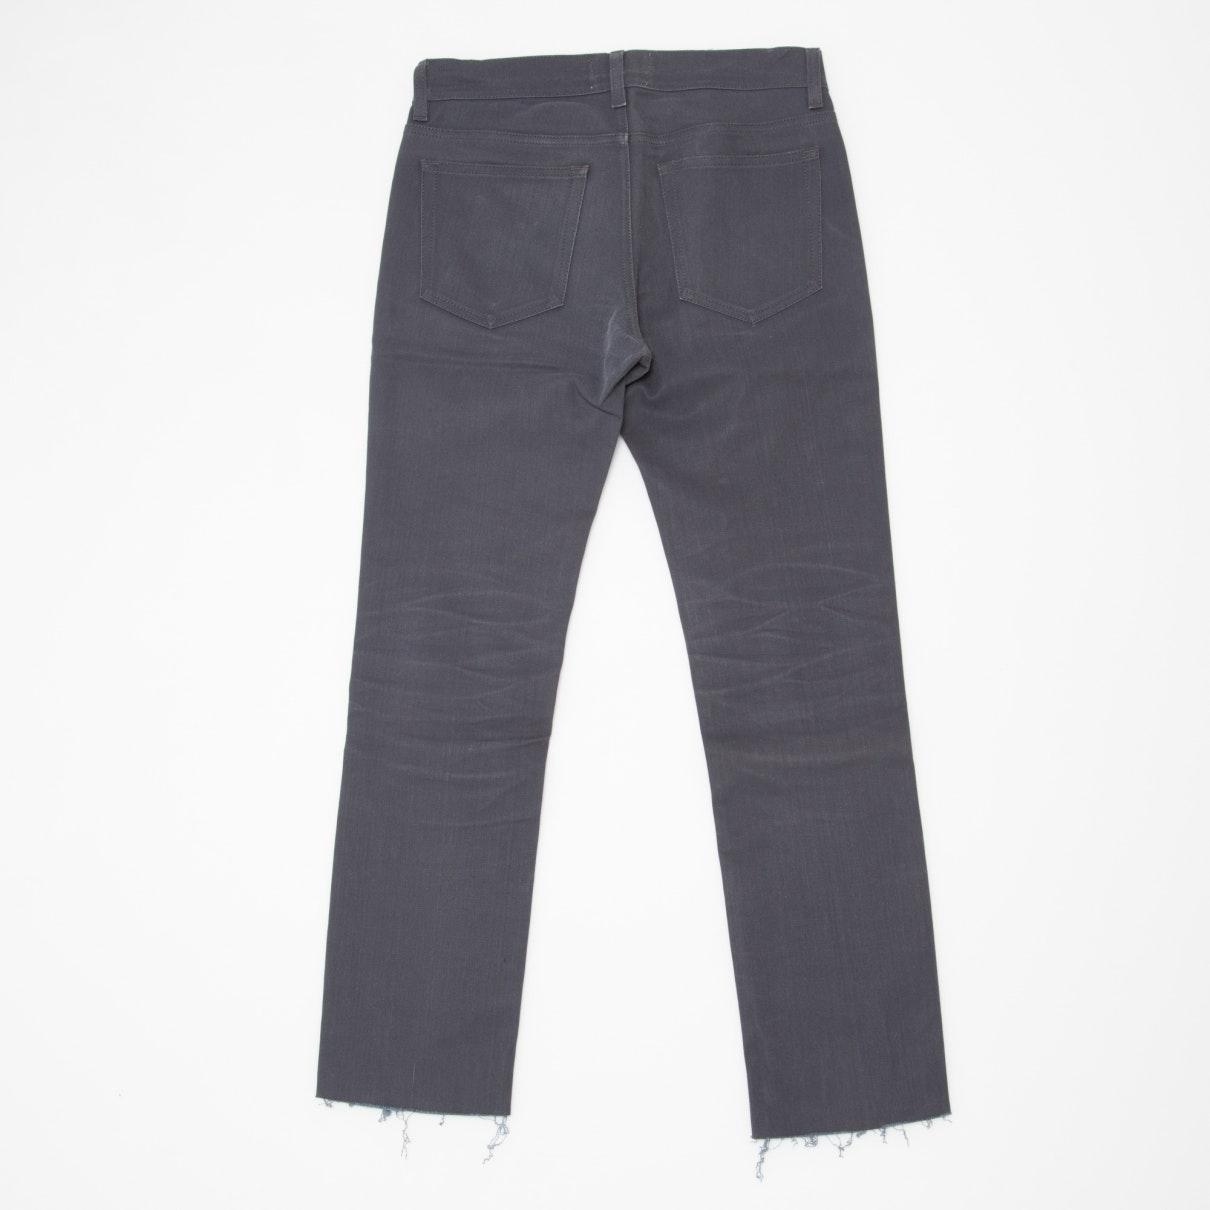 Acne Studios Denim Grey Cotton - Elasthane Jeans in Grey for Men